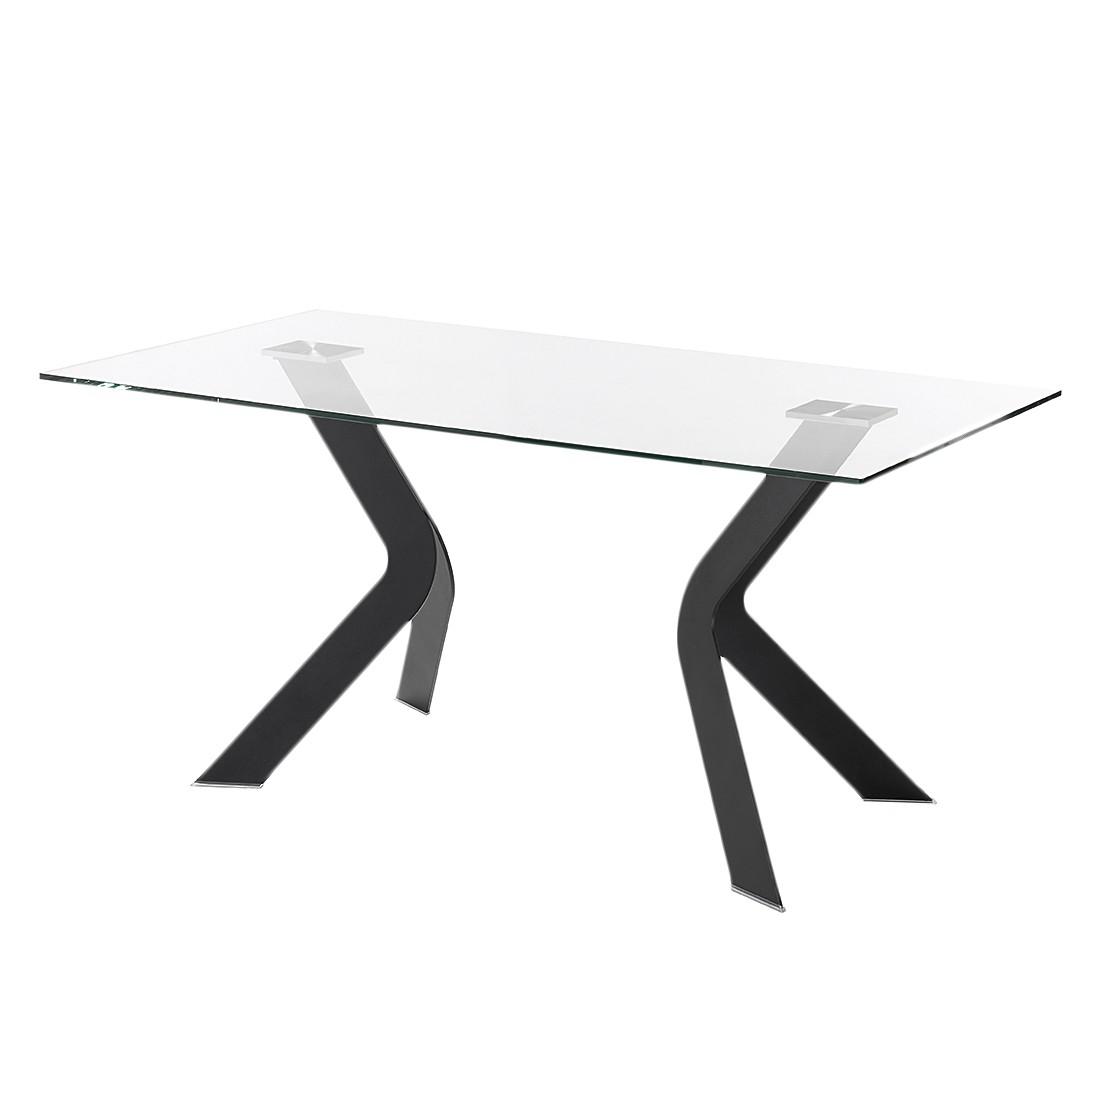 Eettafel Sarinna - glas/roestvrij staal - Helder glas/zwart - 180x90cm, roomscape